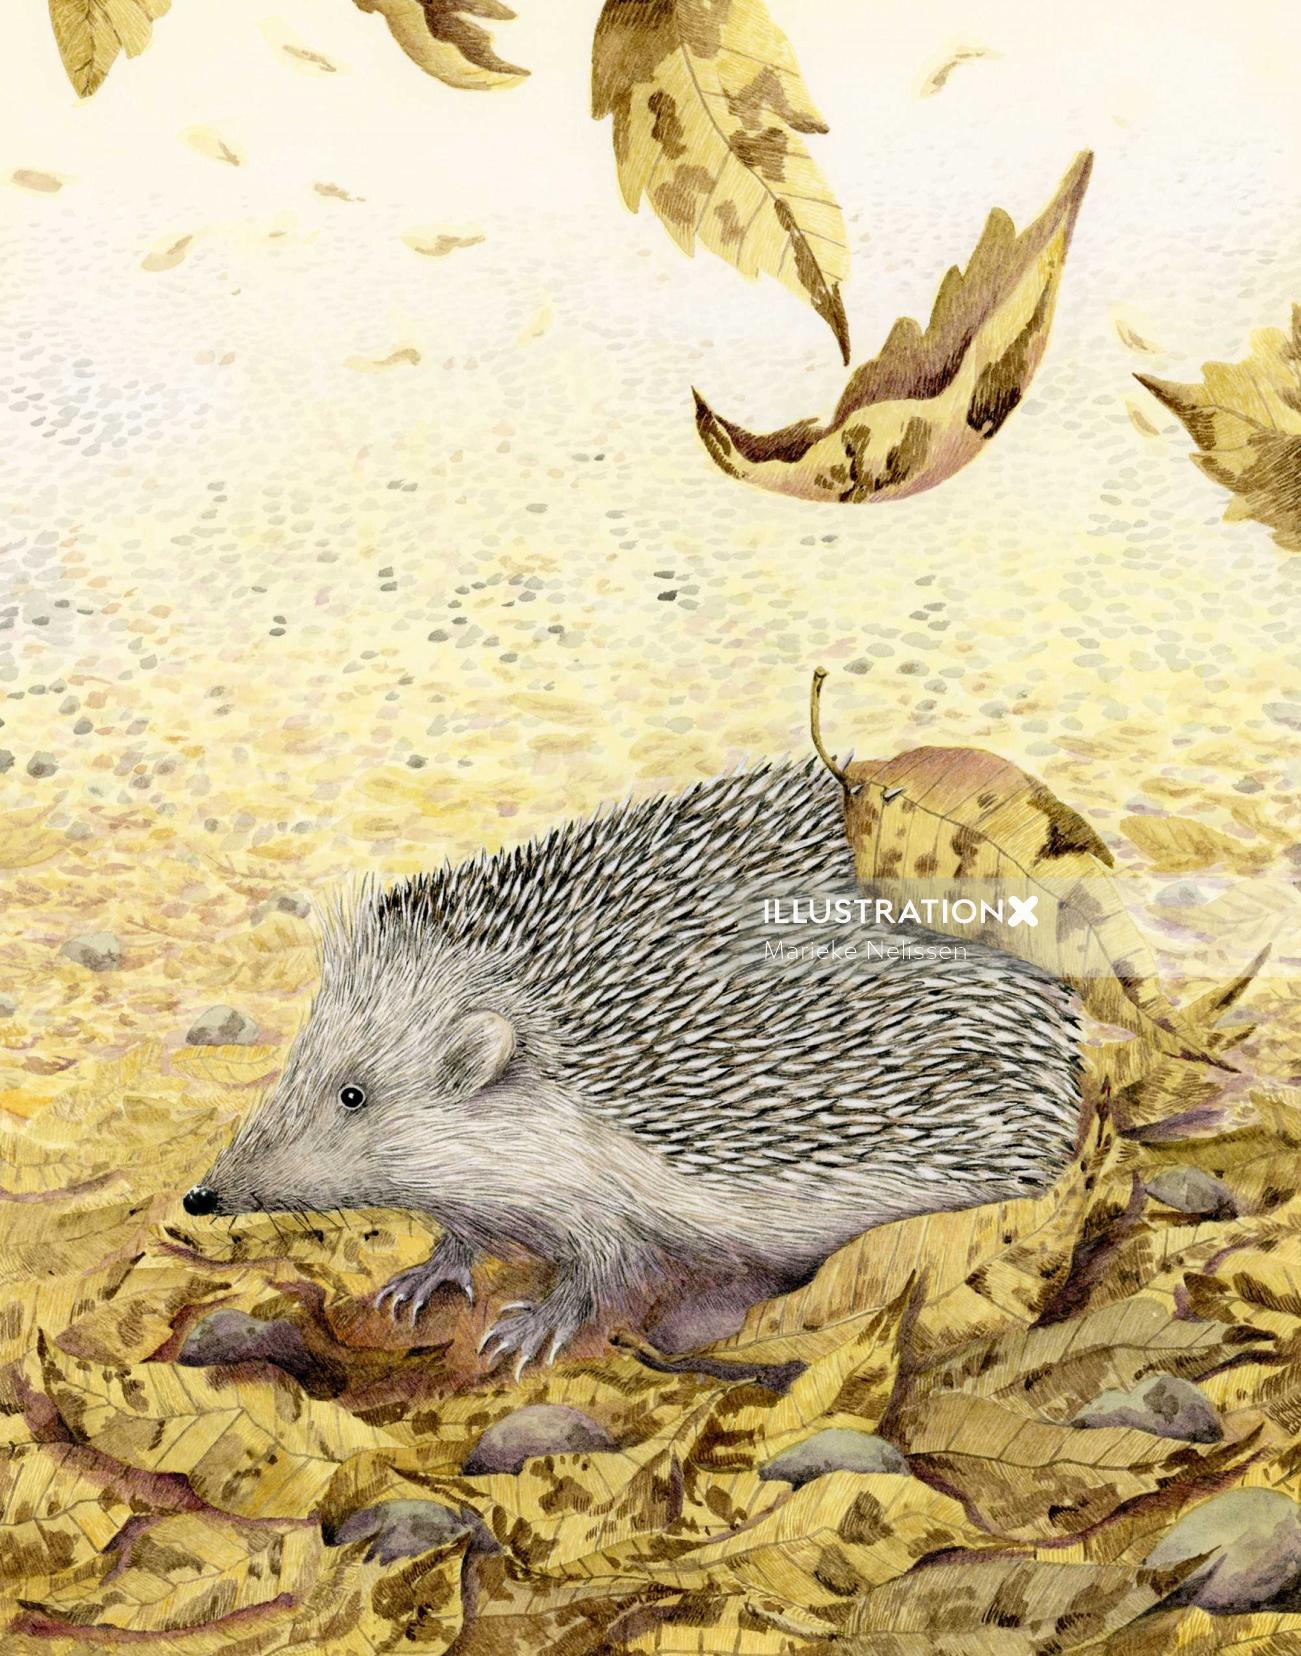 """Hedgehog illustration between autumn leaves """